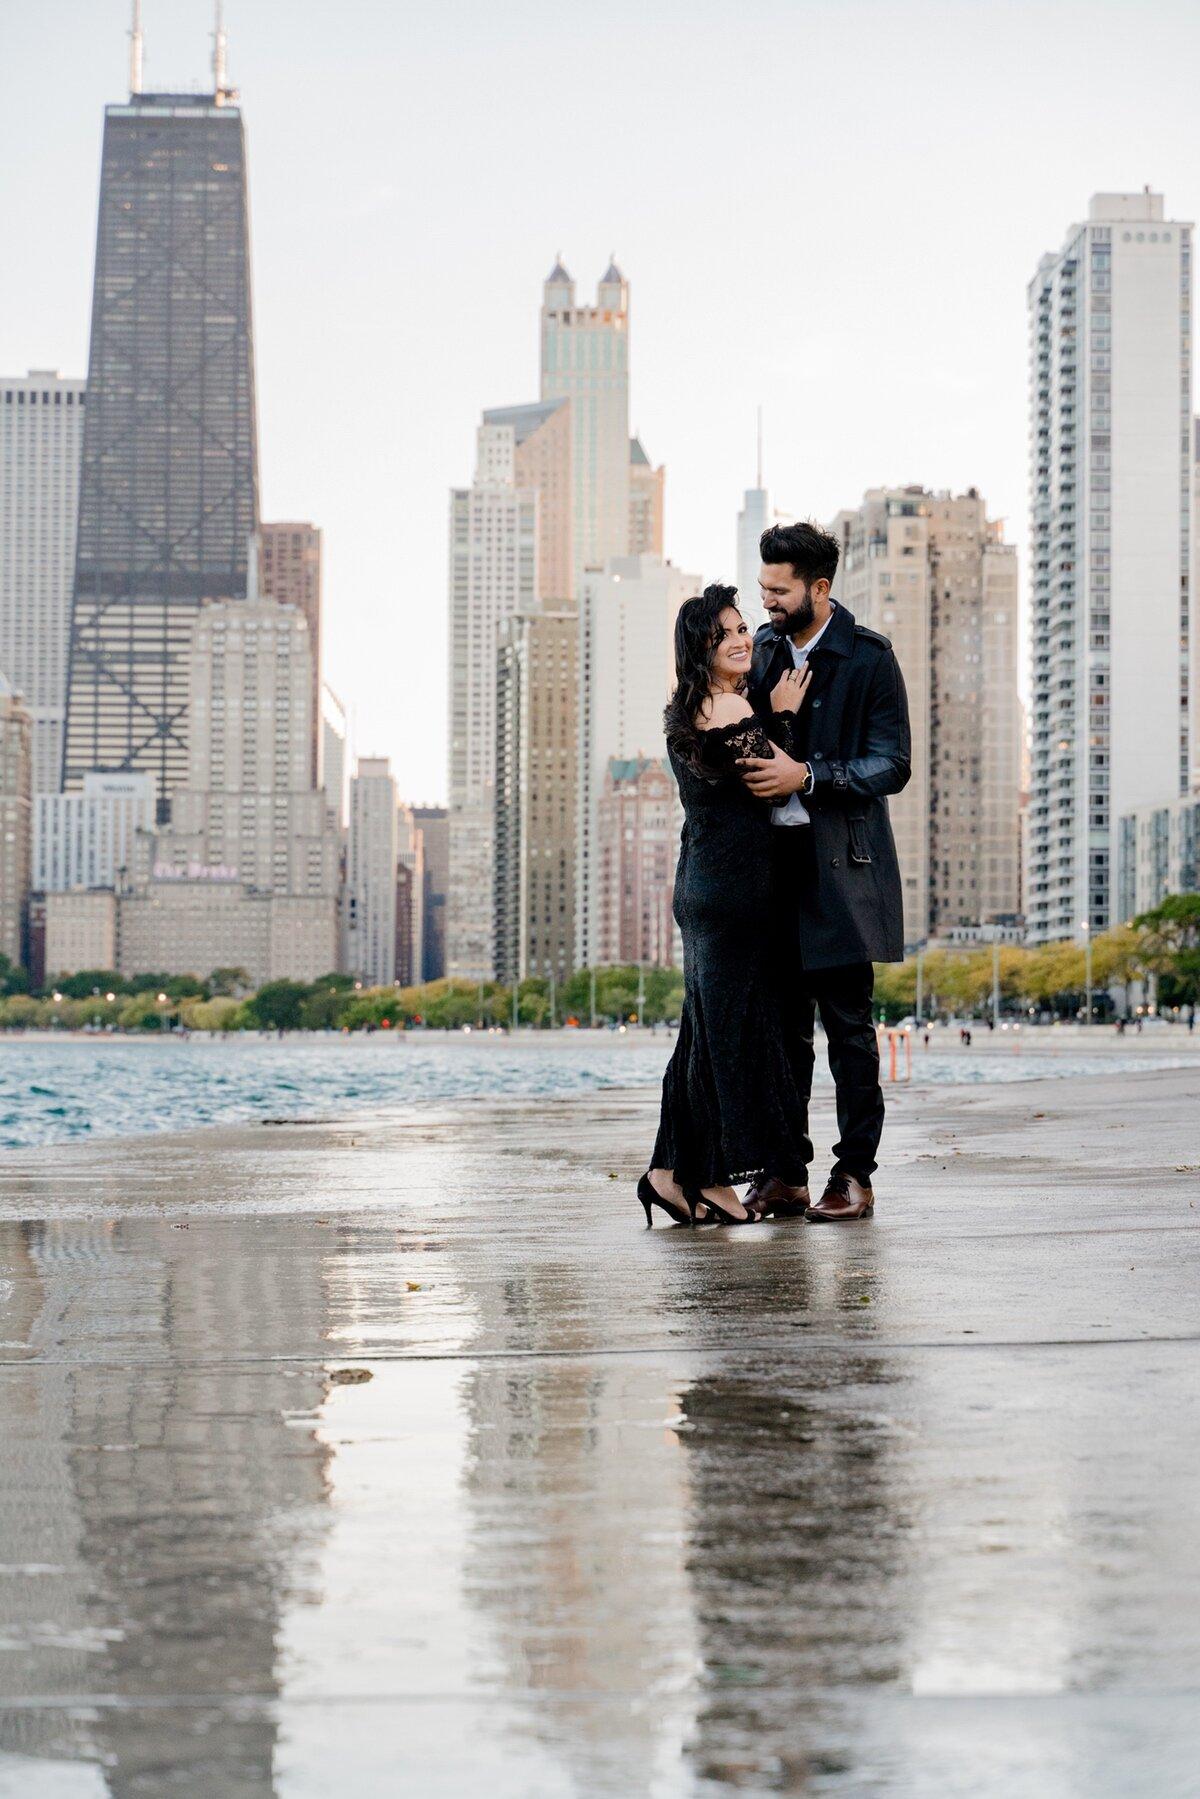 Le Cape Weddings - Chicago Engagement Session - Joann and Bensen -32.jpg